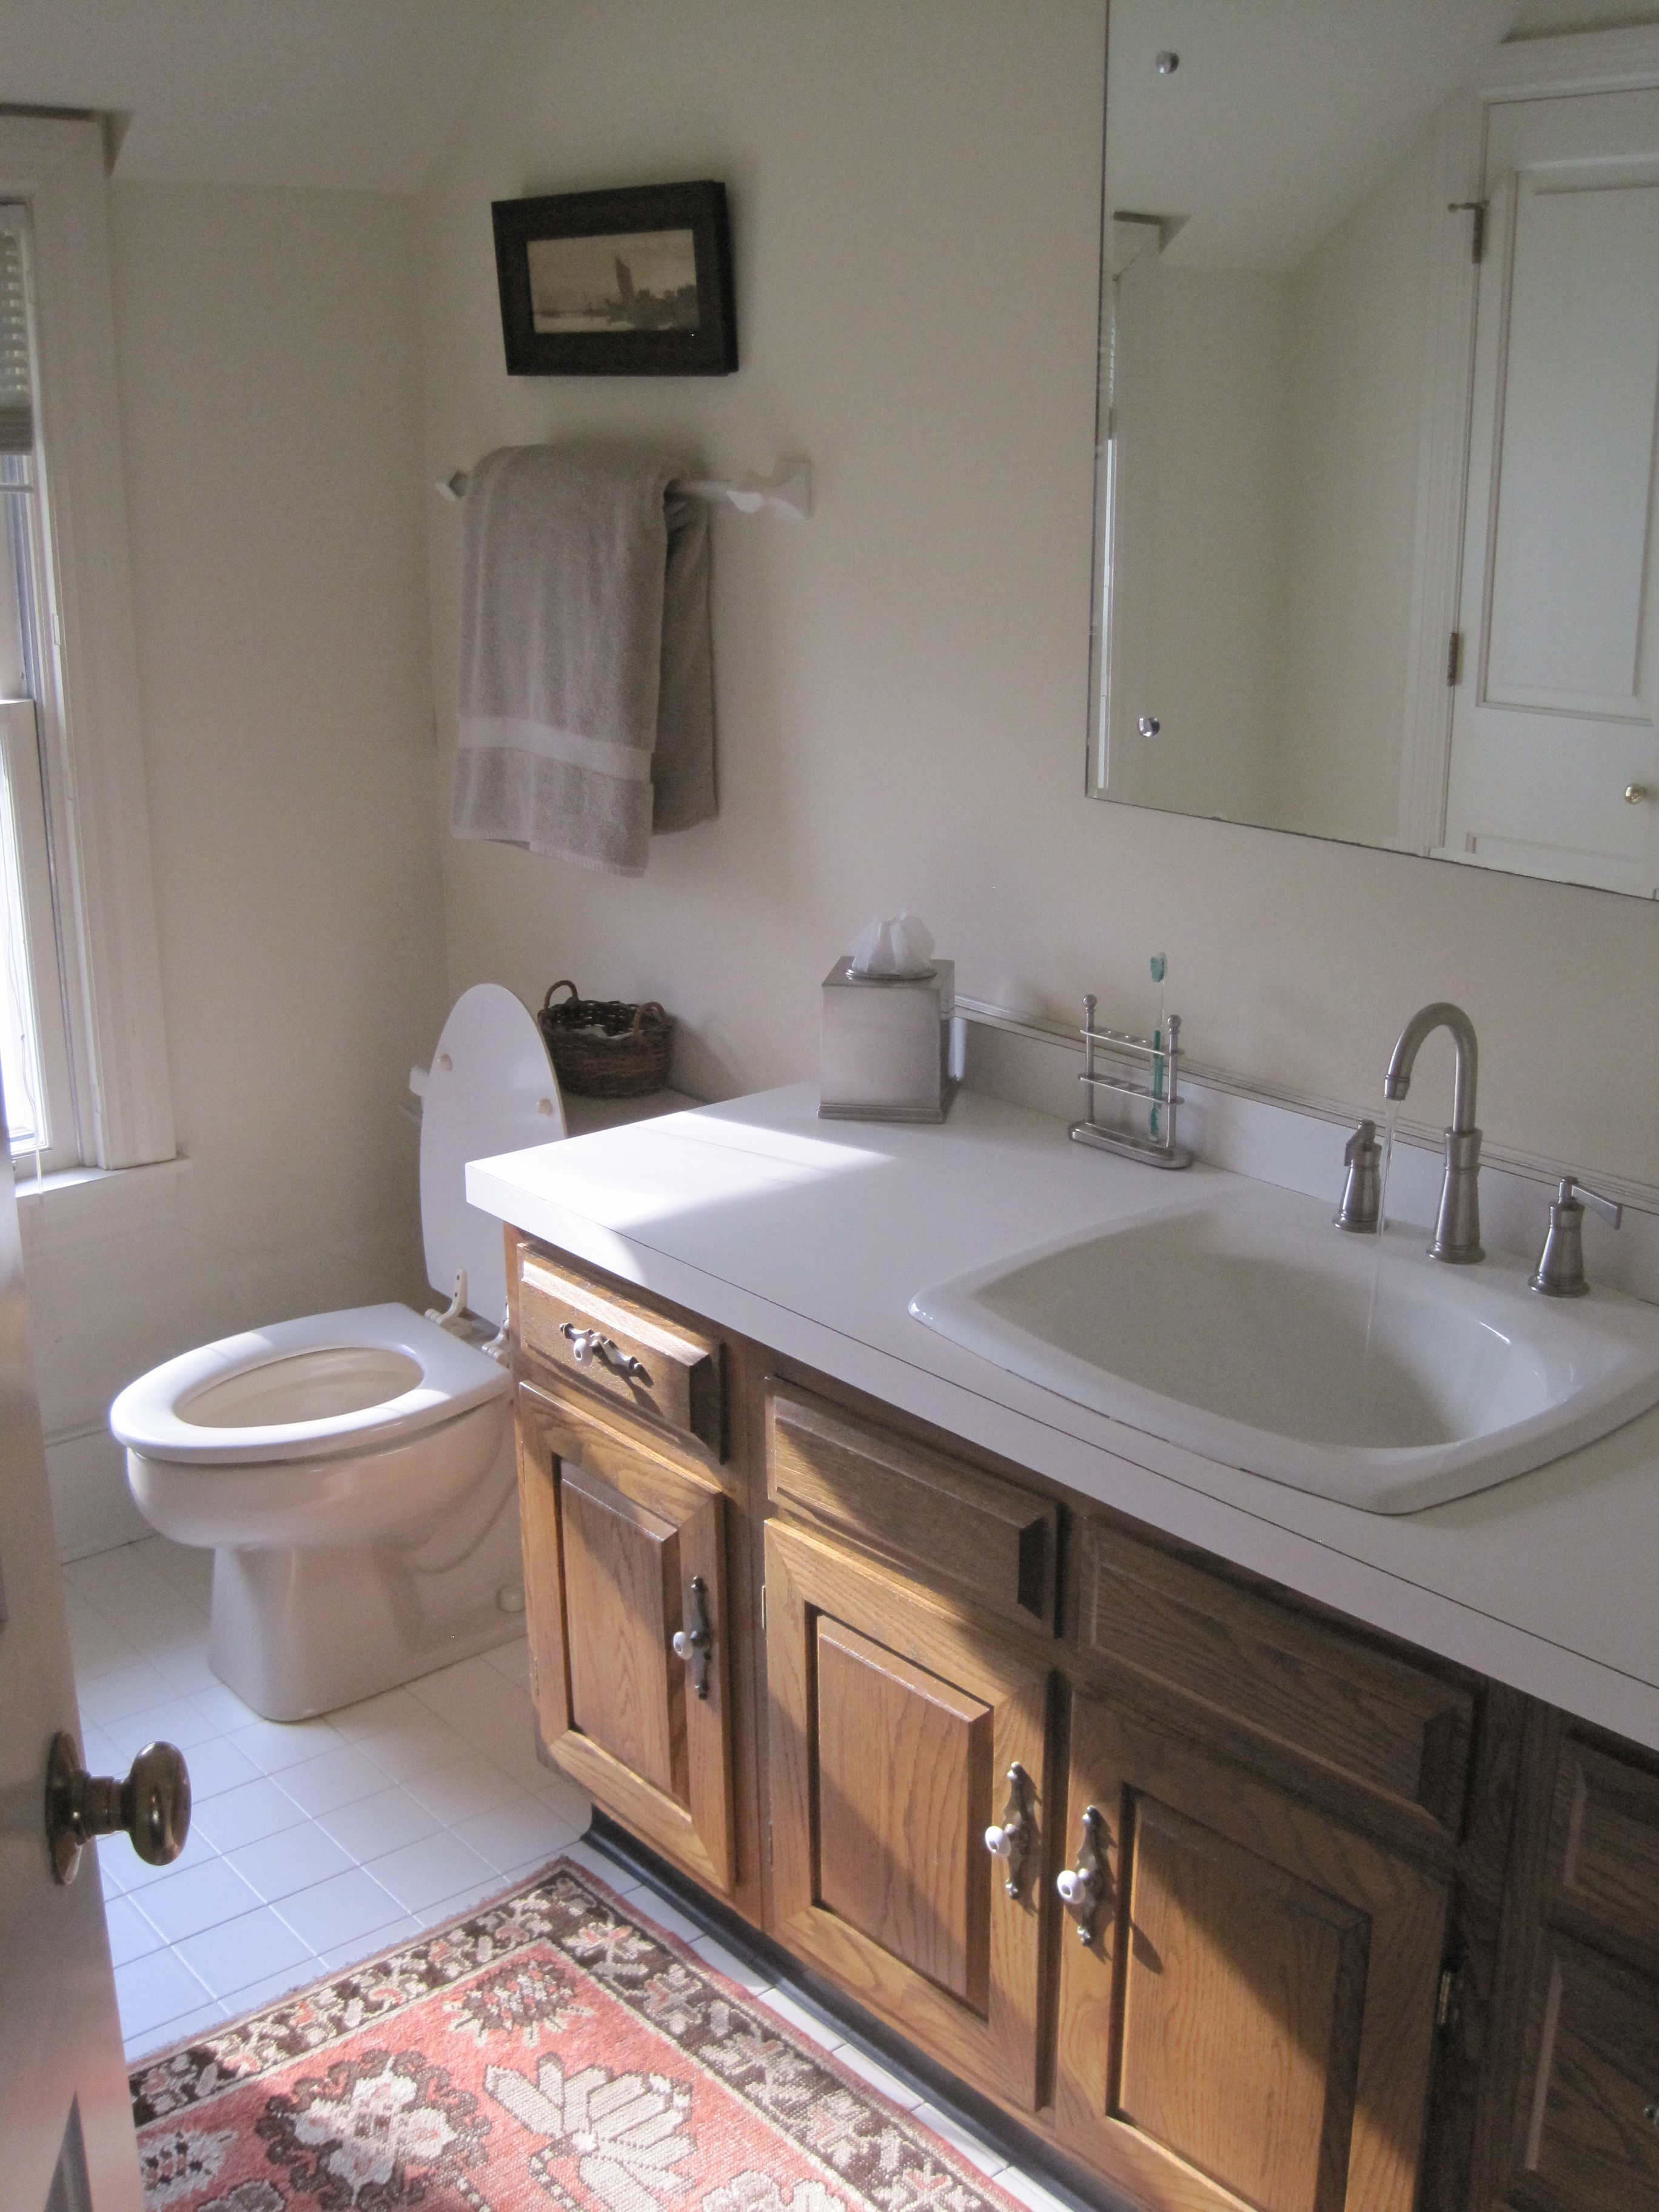 Master Bathroom Makeover Maple Magnolia - Cosmetic bathroom makeover